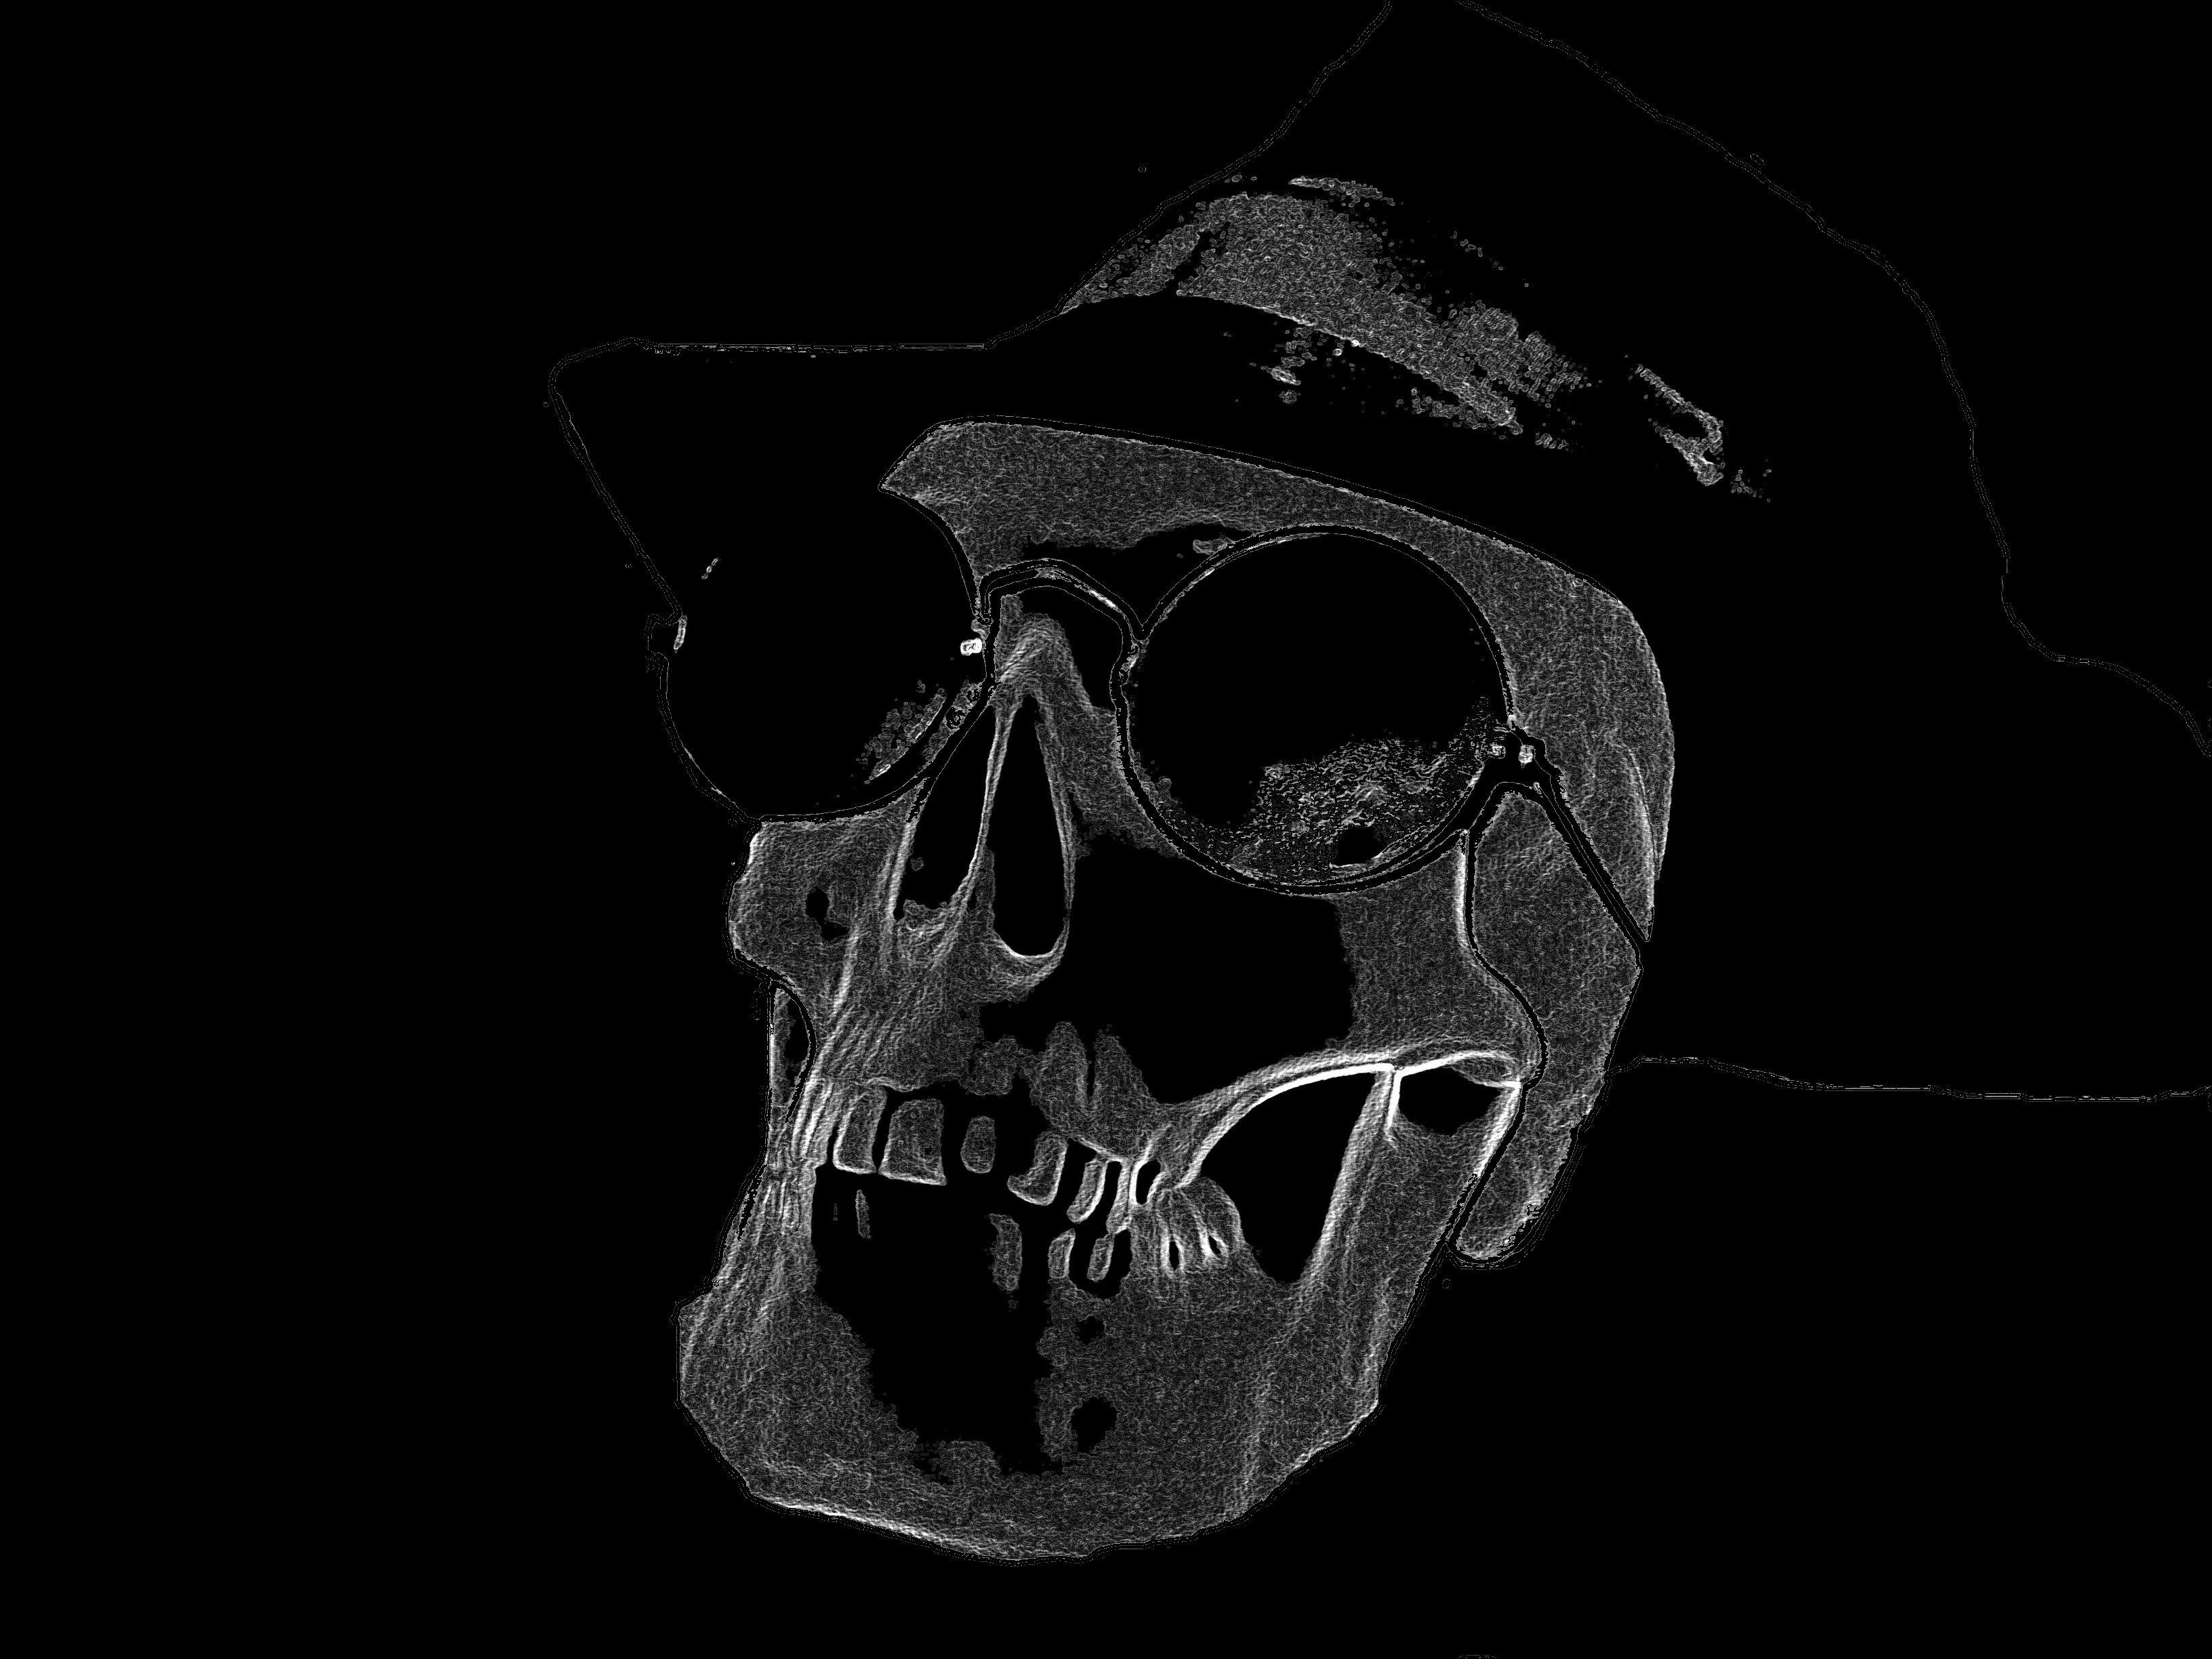 Free Download Free Download Black And White Skulls Hd Wallpaper